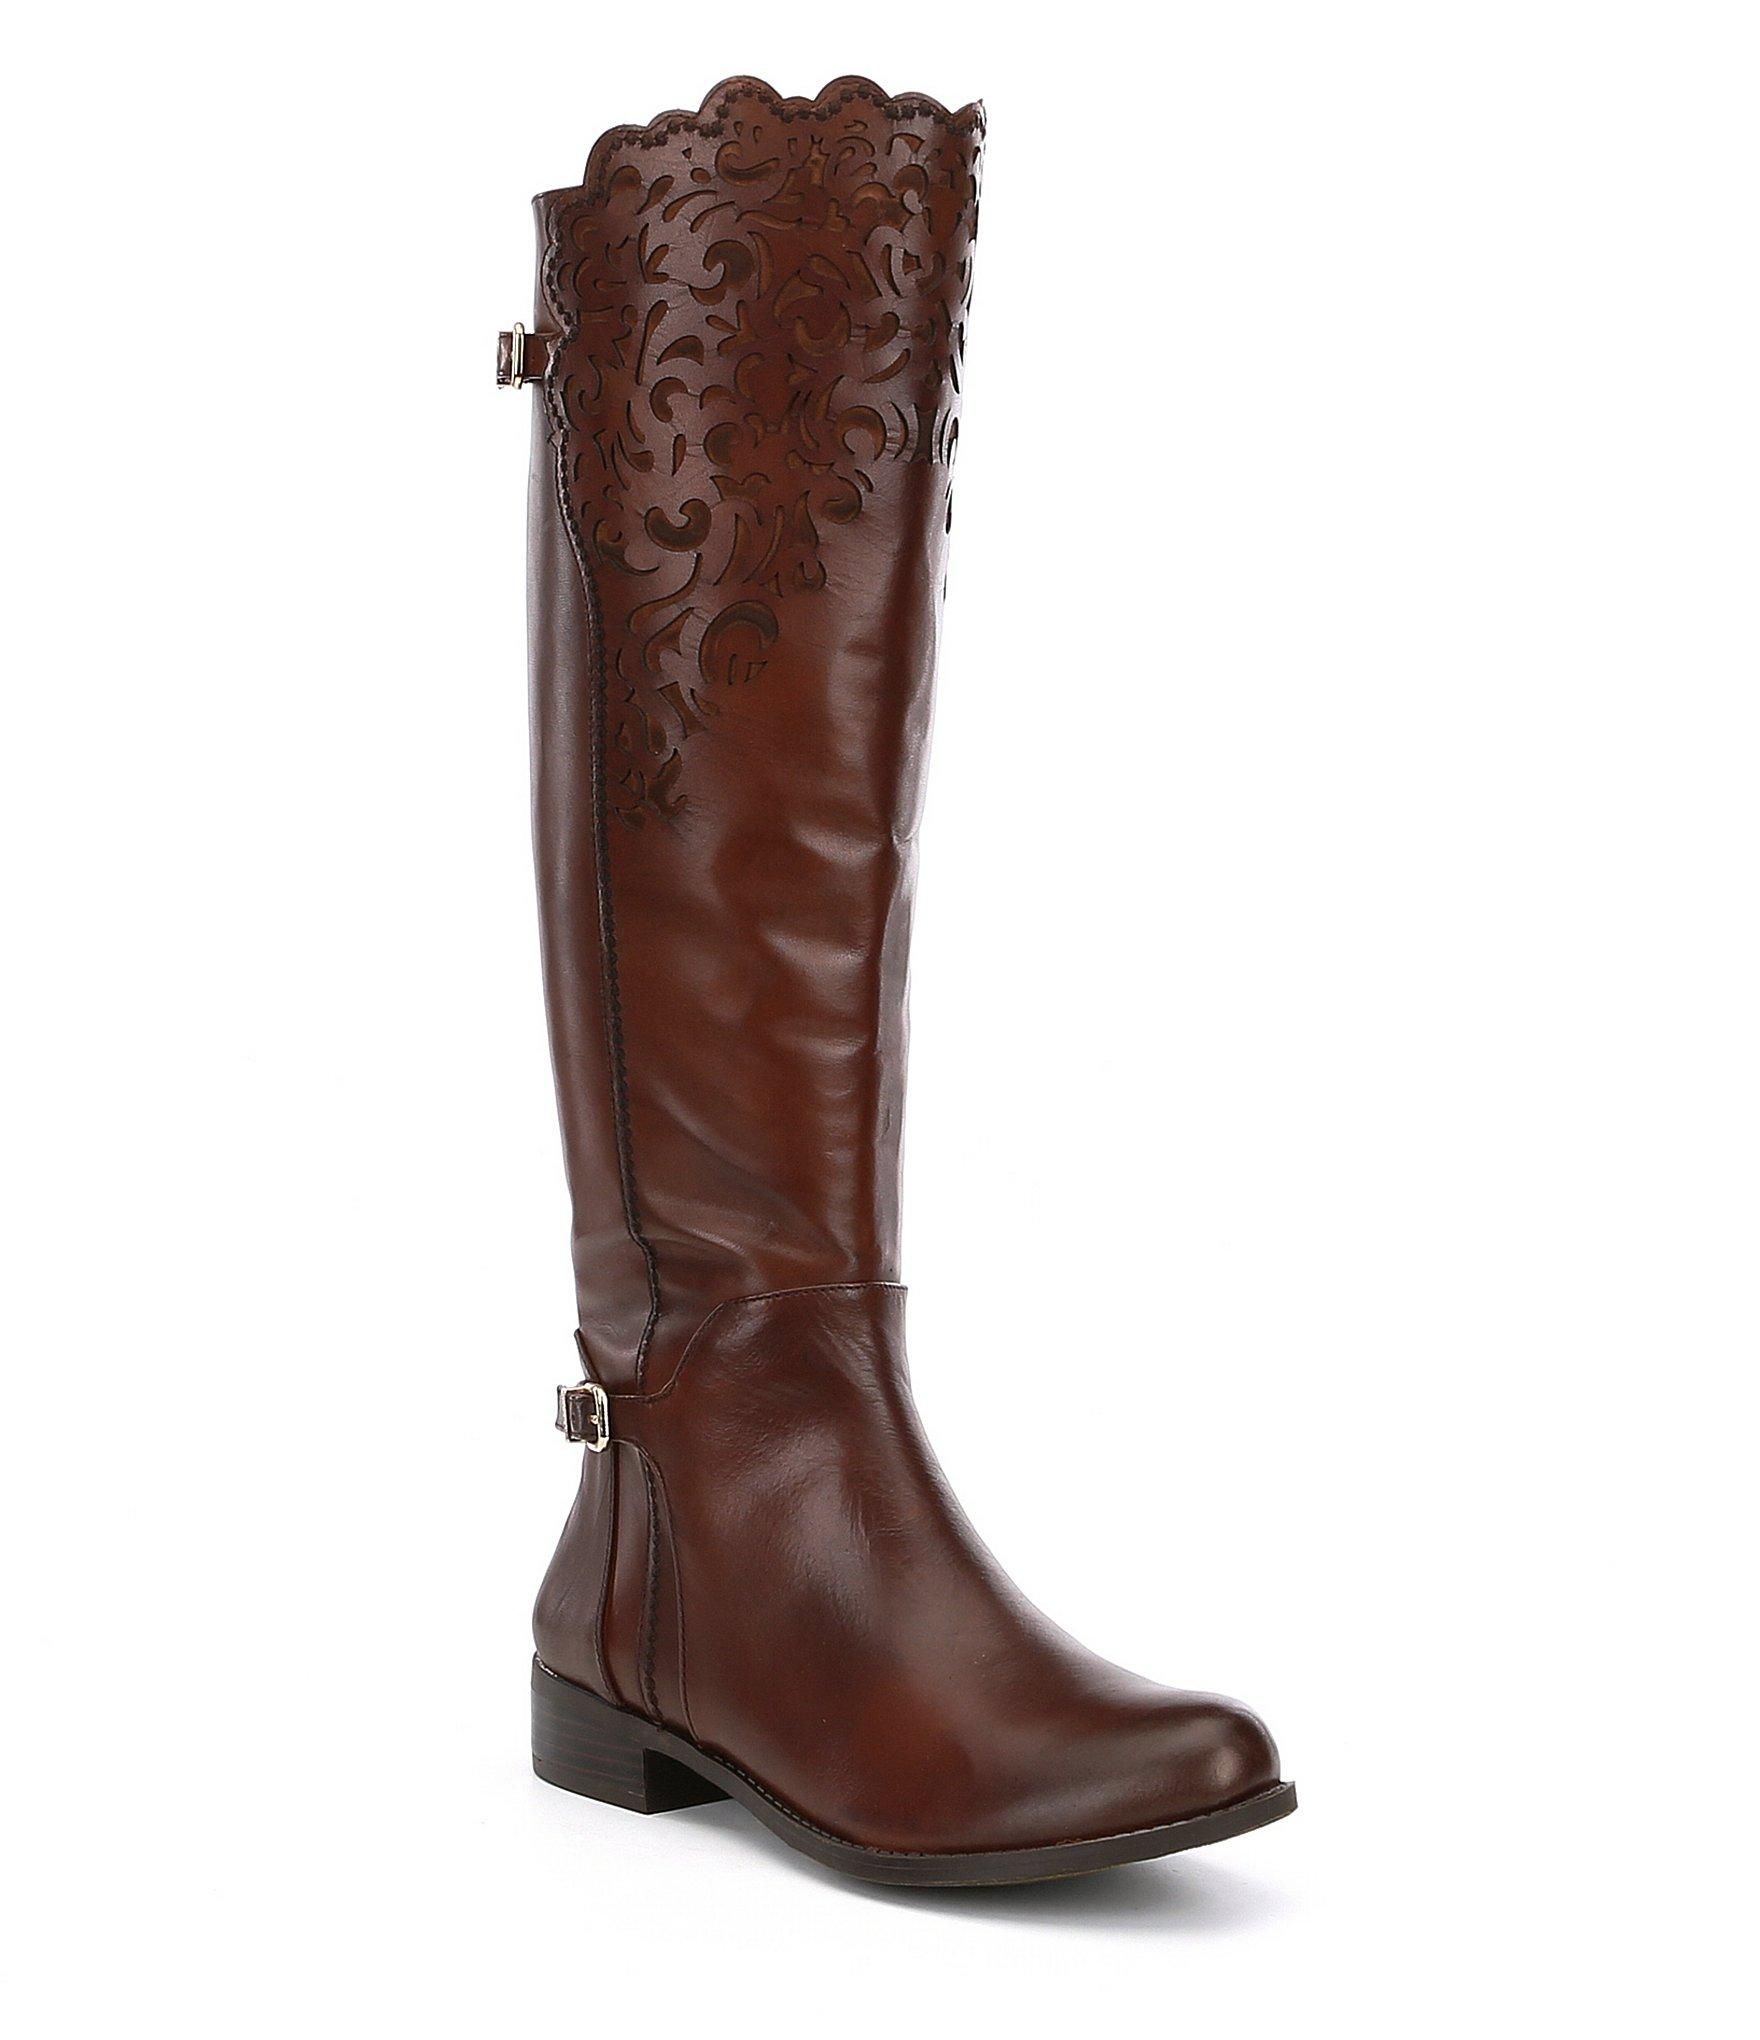 womenu0027s riding boots | dillards.com bhgcqws